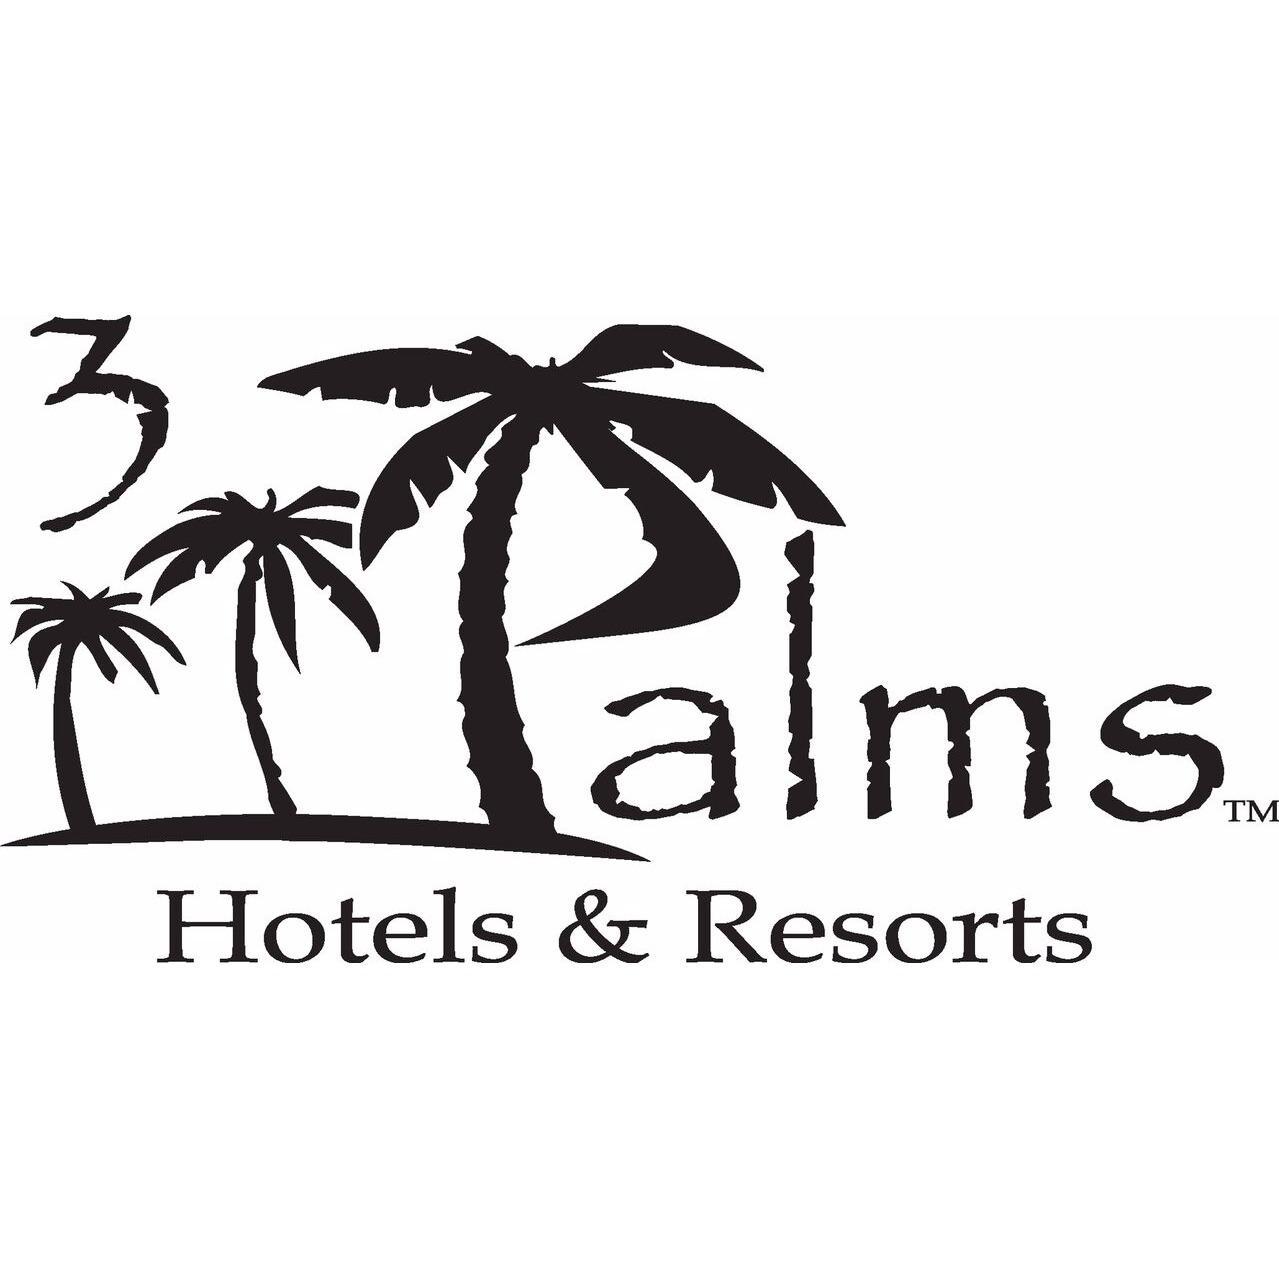 3 Palms - The Palms Hotel & Villas